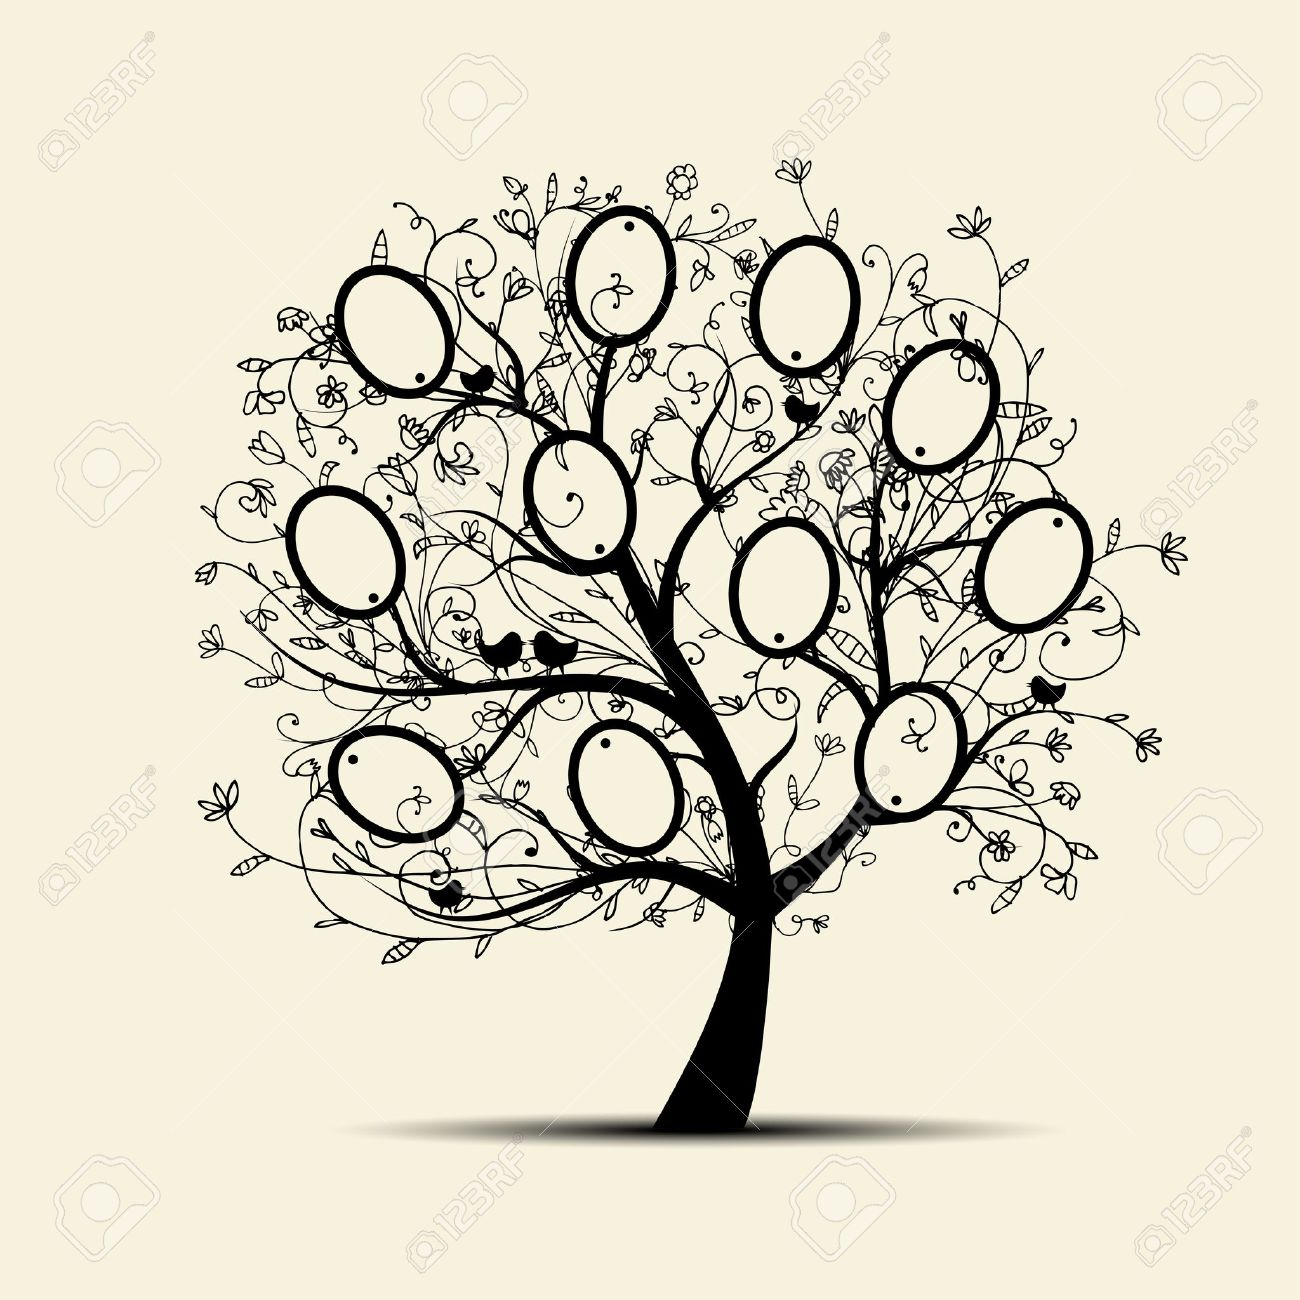 1300x1300 Grand Aspire Family Tree Frame Wall Decor Reviews Wayfair Similiar